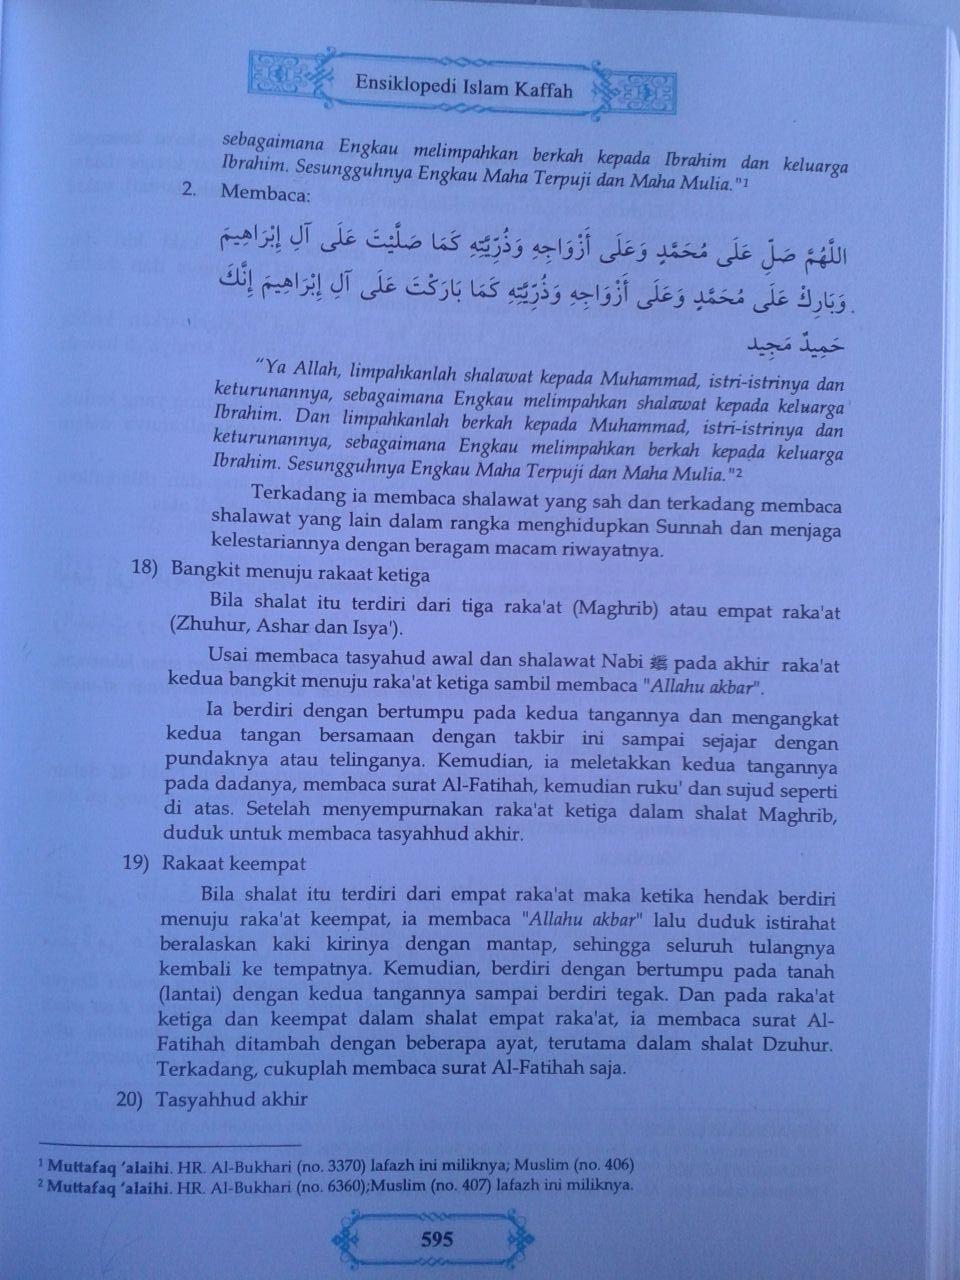 Buku Ensiklopedi Islam Kaffah Edisi Terlengkap isi 2